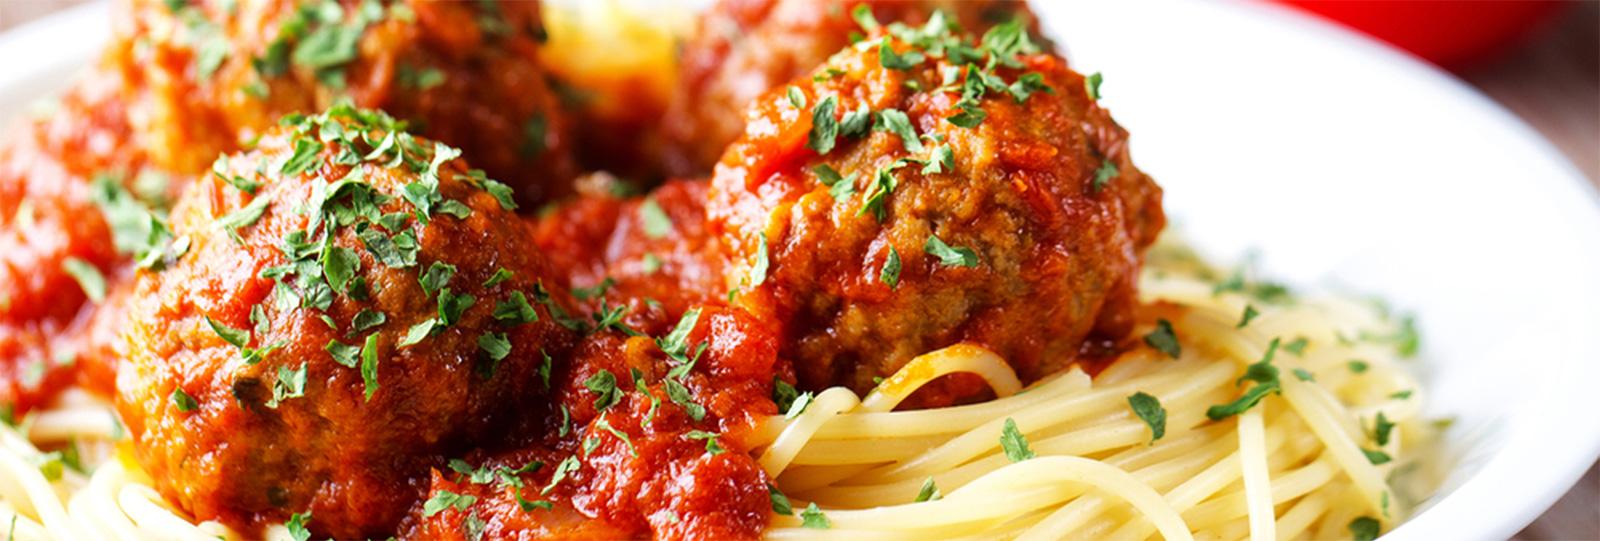 gordon ramsay spaghetti recipe, meatballs